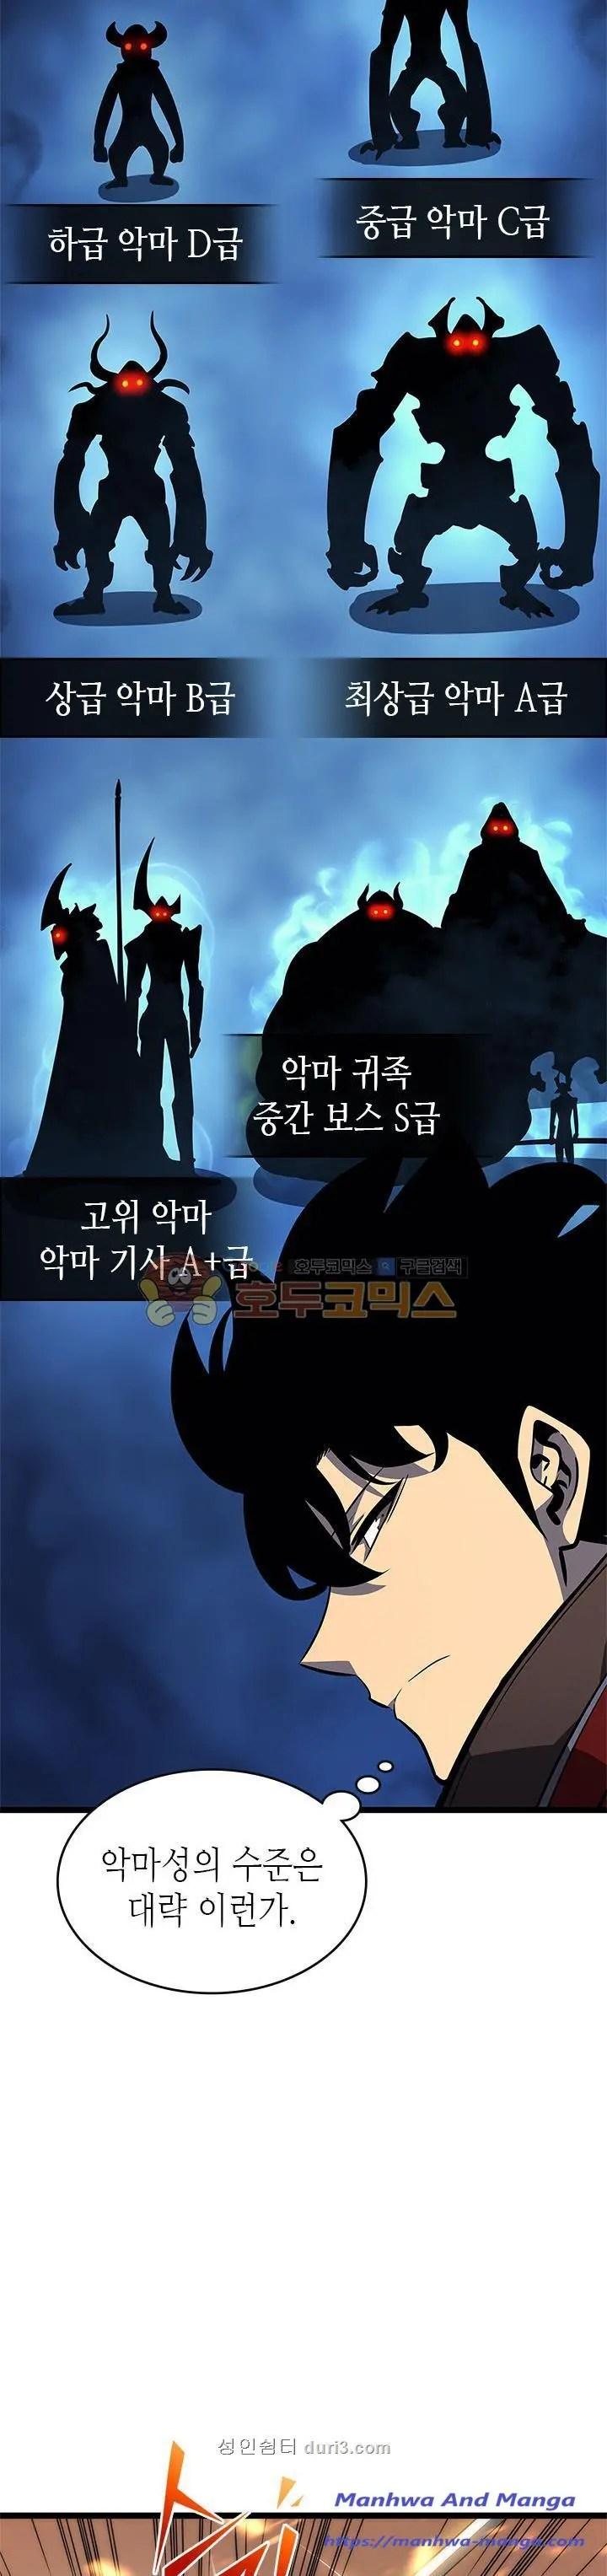 Solo Leveling 82 – 나 혼자만 레벨업 82화 | Manhwa And Manga